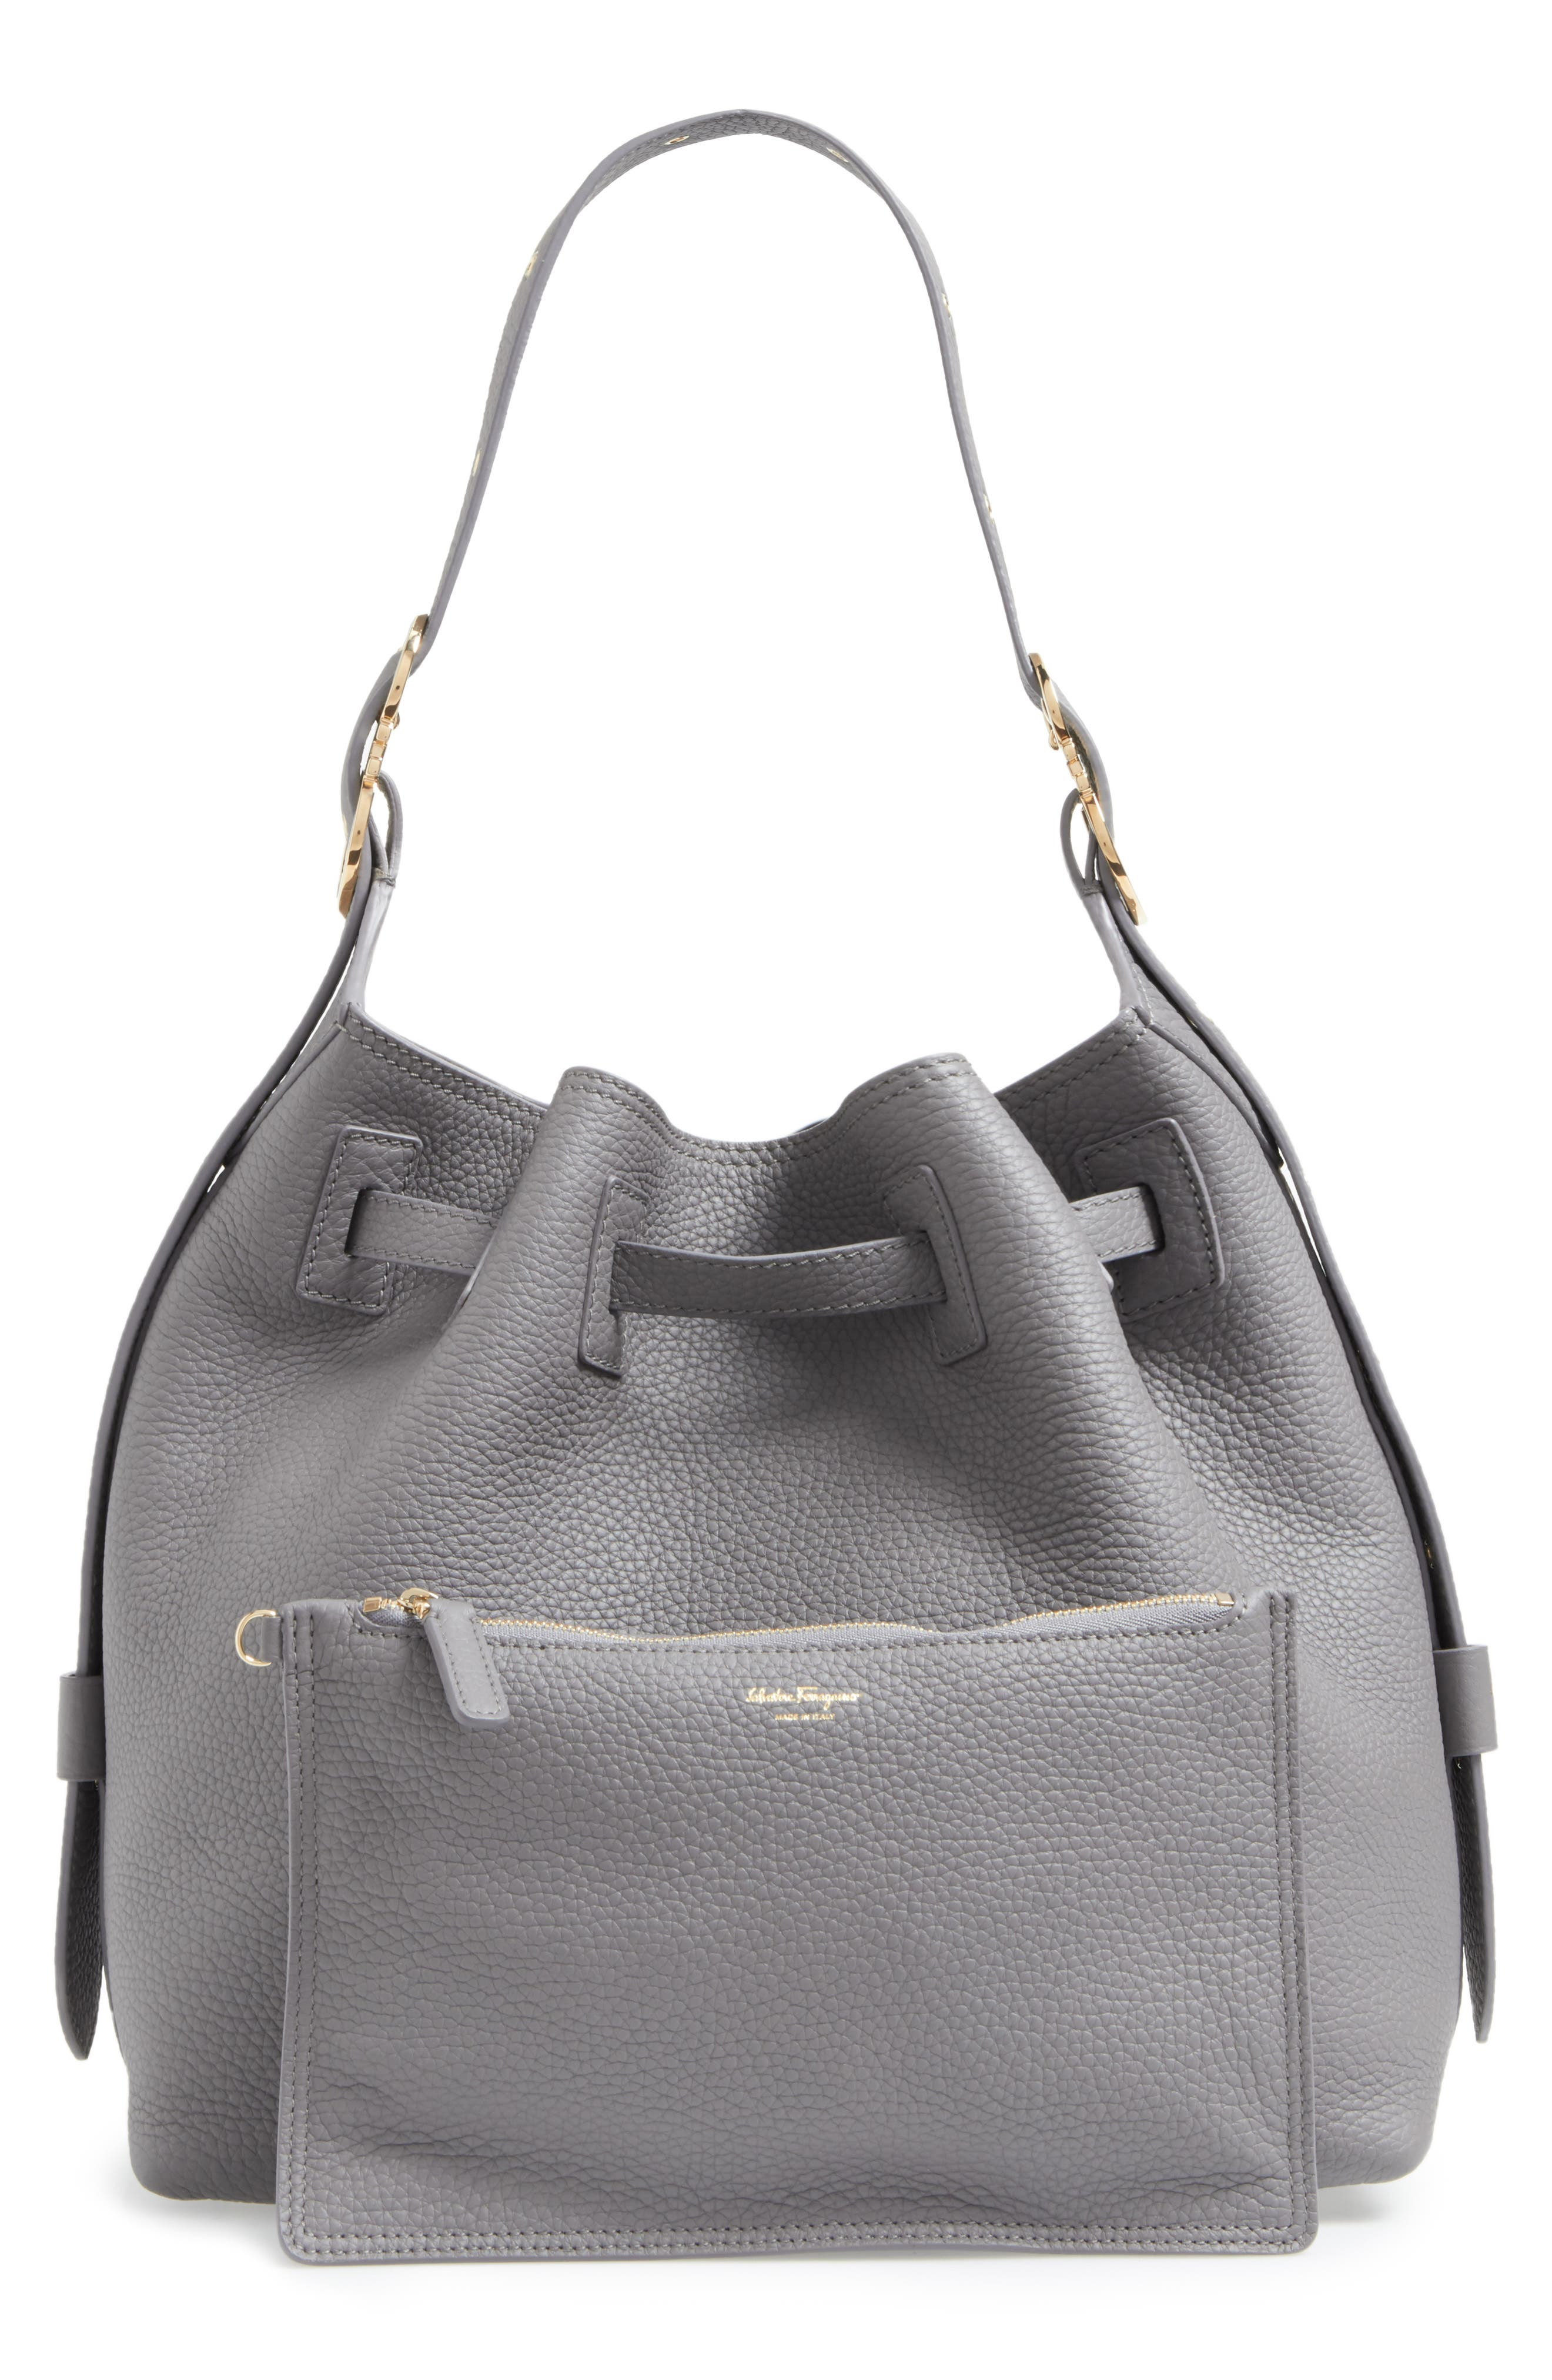 SALVATORE FERRAGAMO,                             Pebbled Leather Drawstring Bucket Bag,                             Alternate thumbnail 3, color,                             020